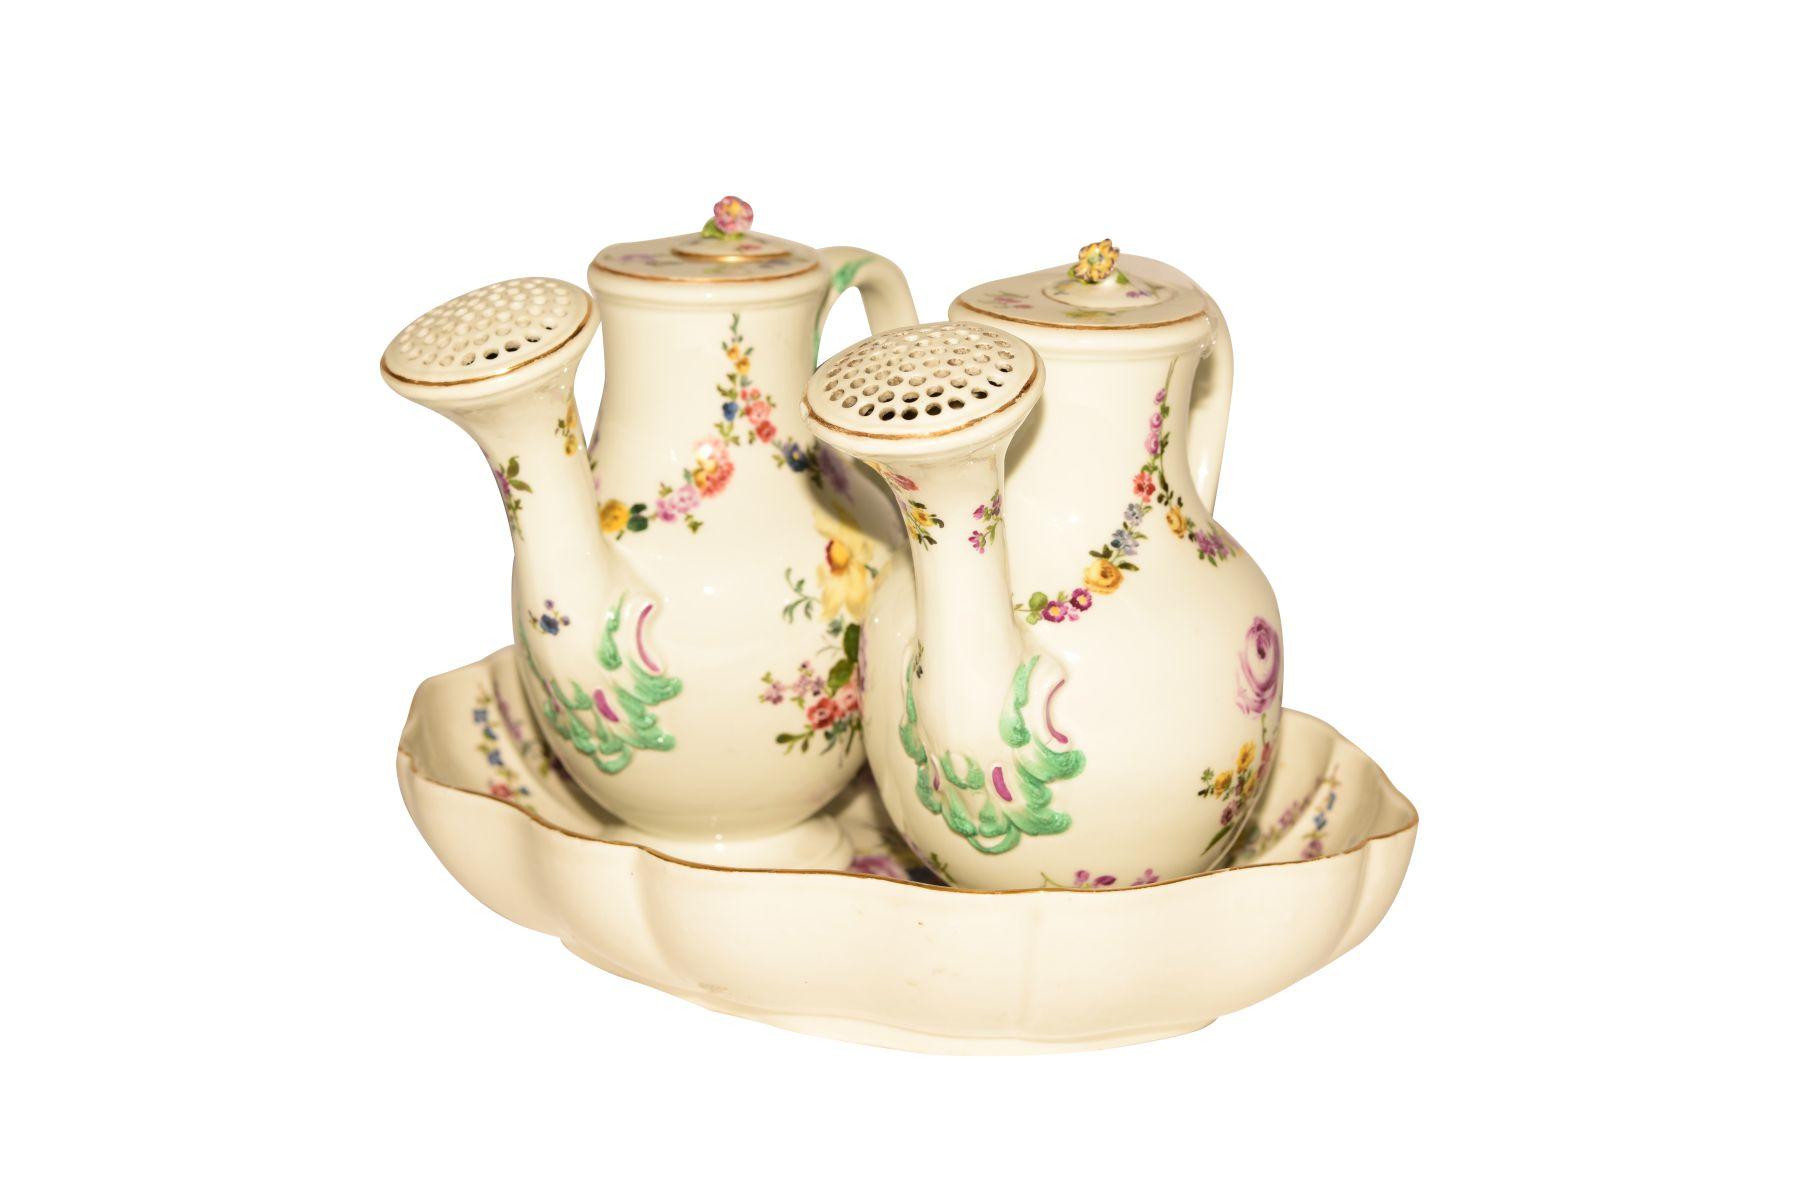 #101 Flower pots on Présentoir Meissen 1730 | Blumenkannen auf Présentoir Meissen 1730 Image